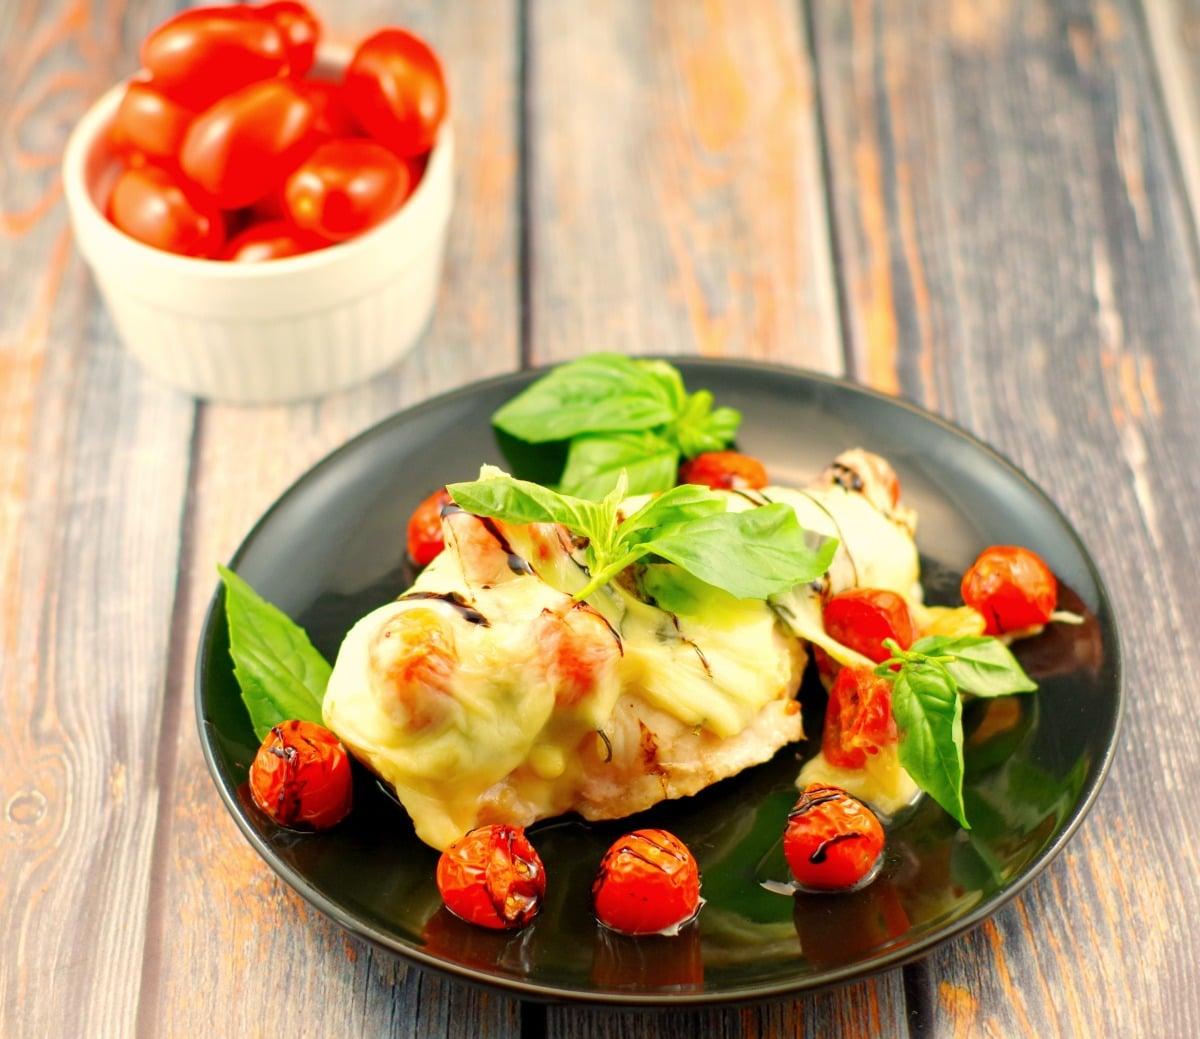 Caprese Sheet Pan Chicken dinner | #bakedchicken #chickenbreast recipes - Foodmeanderings.com